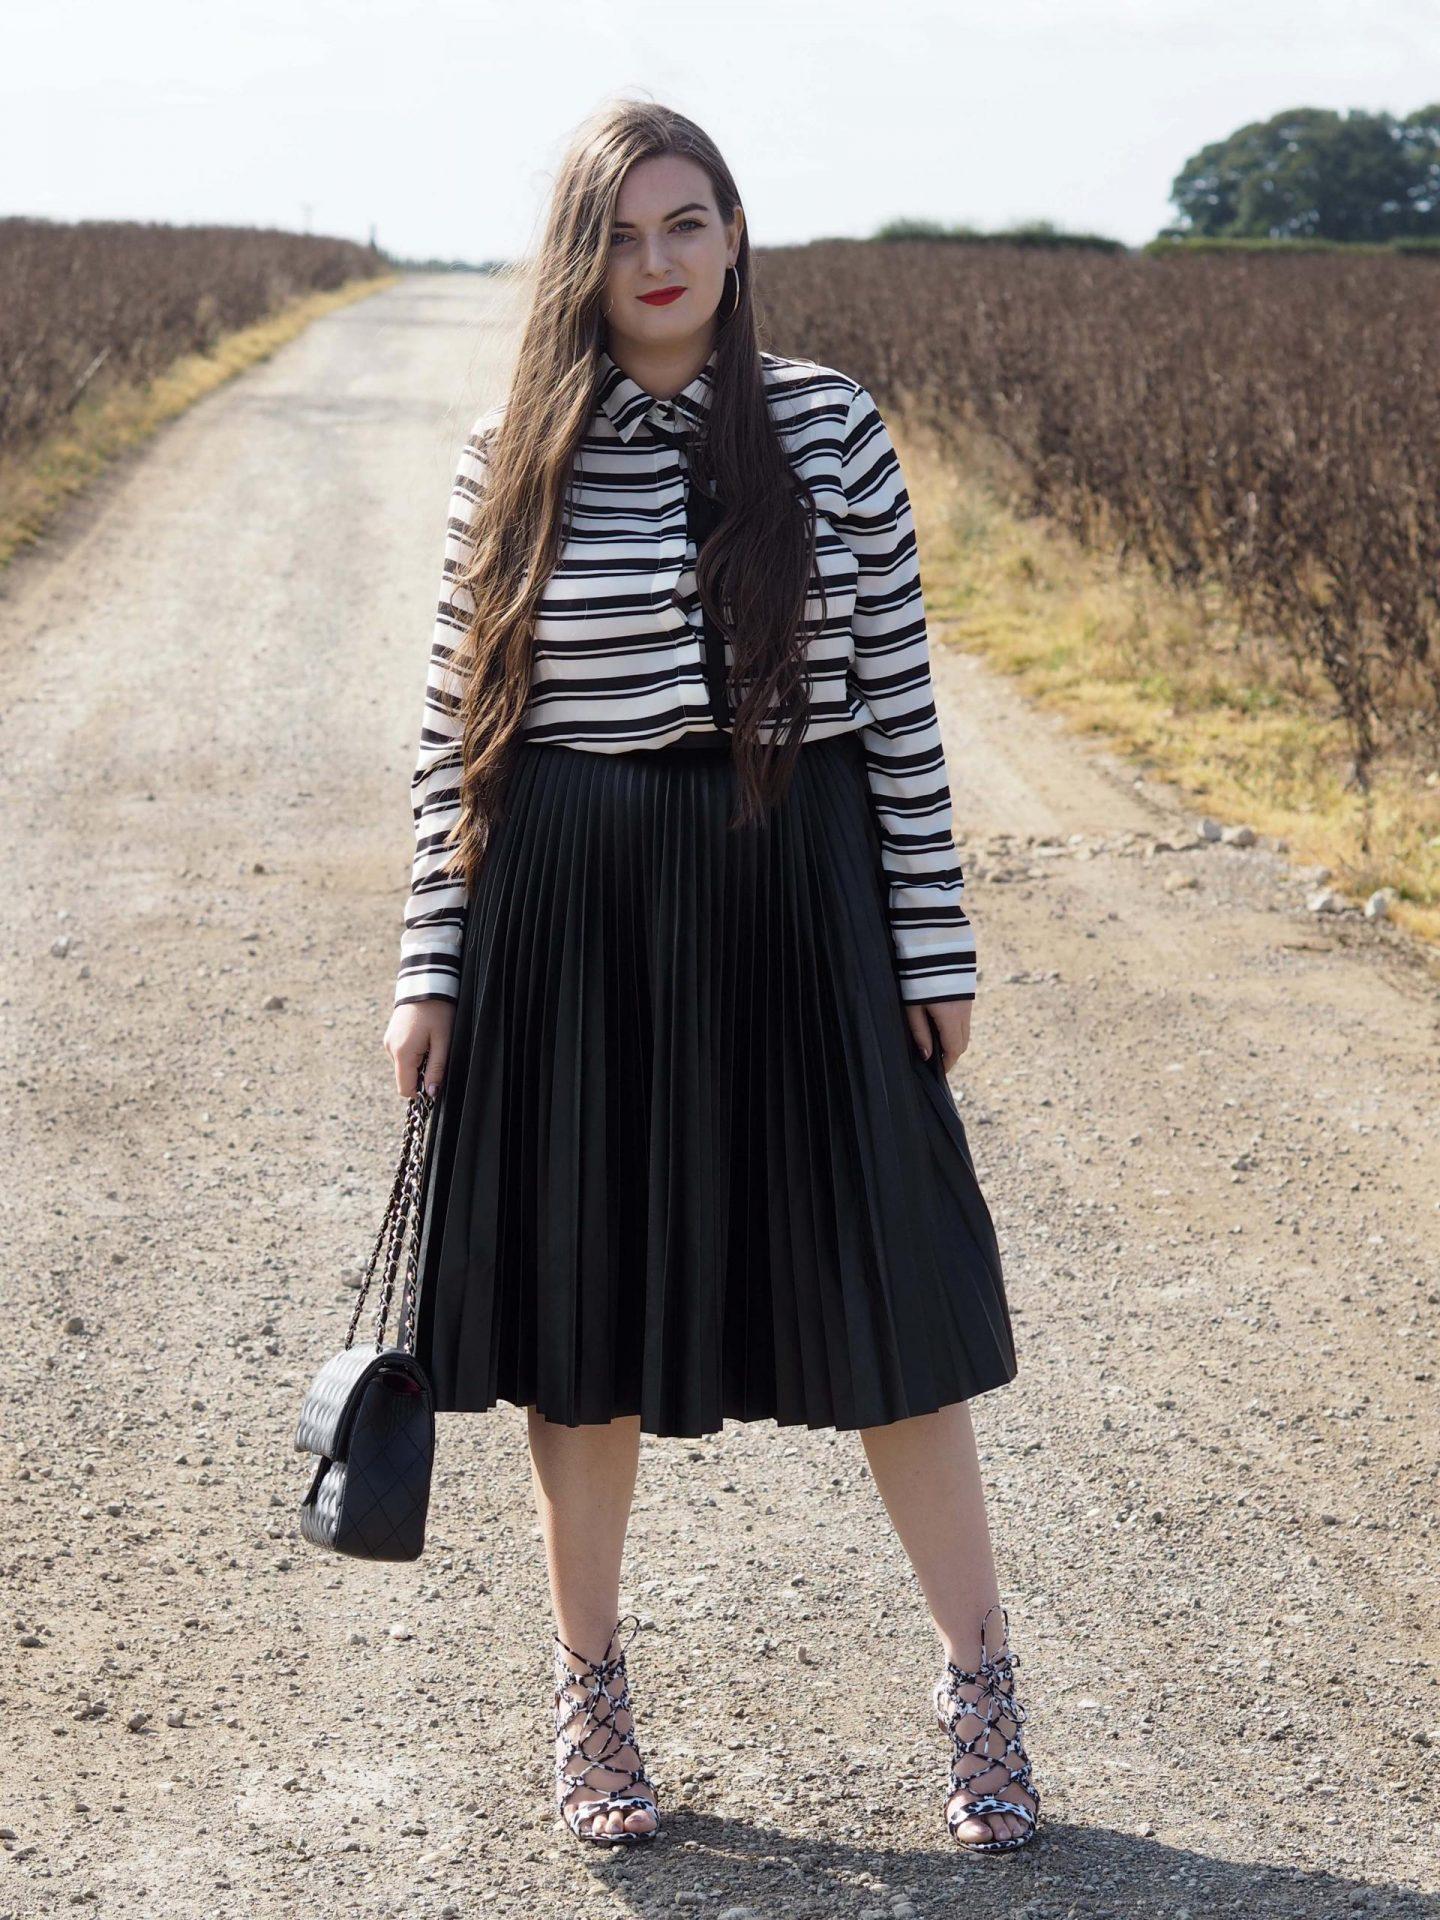 closet-leather-pleated-skirts-and-stripes-rachel-nicole-uk-blogger-2